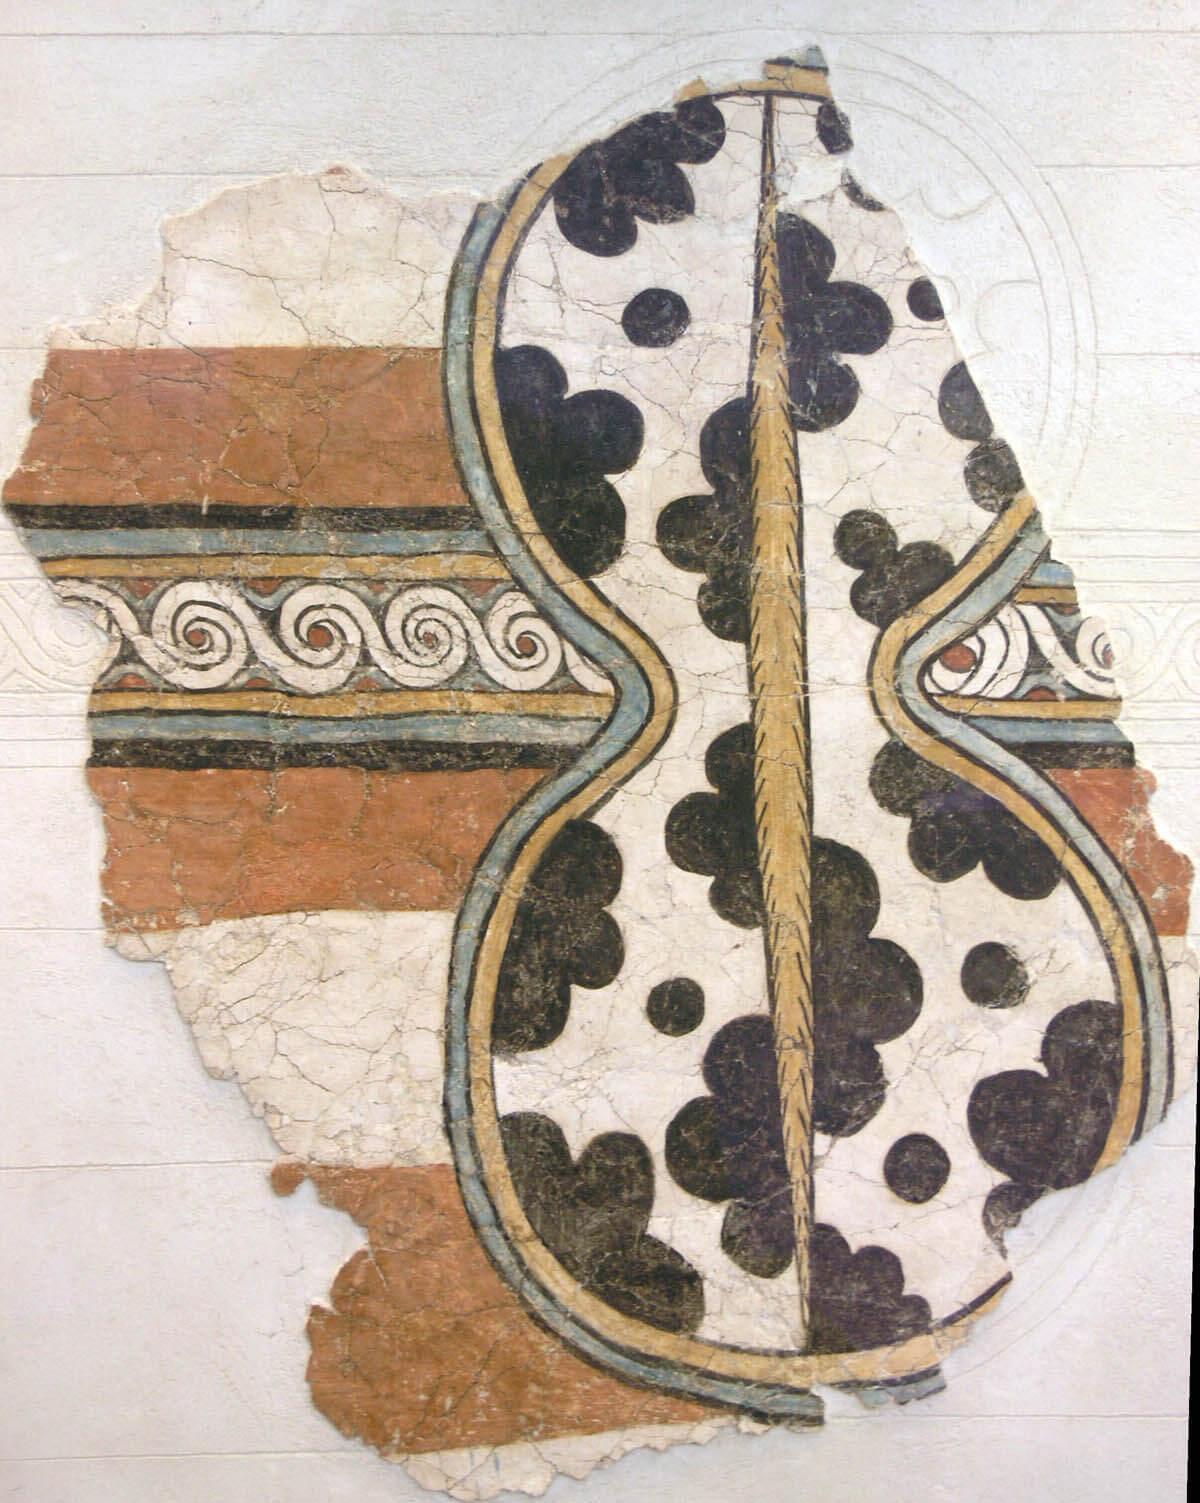 escudo micénico